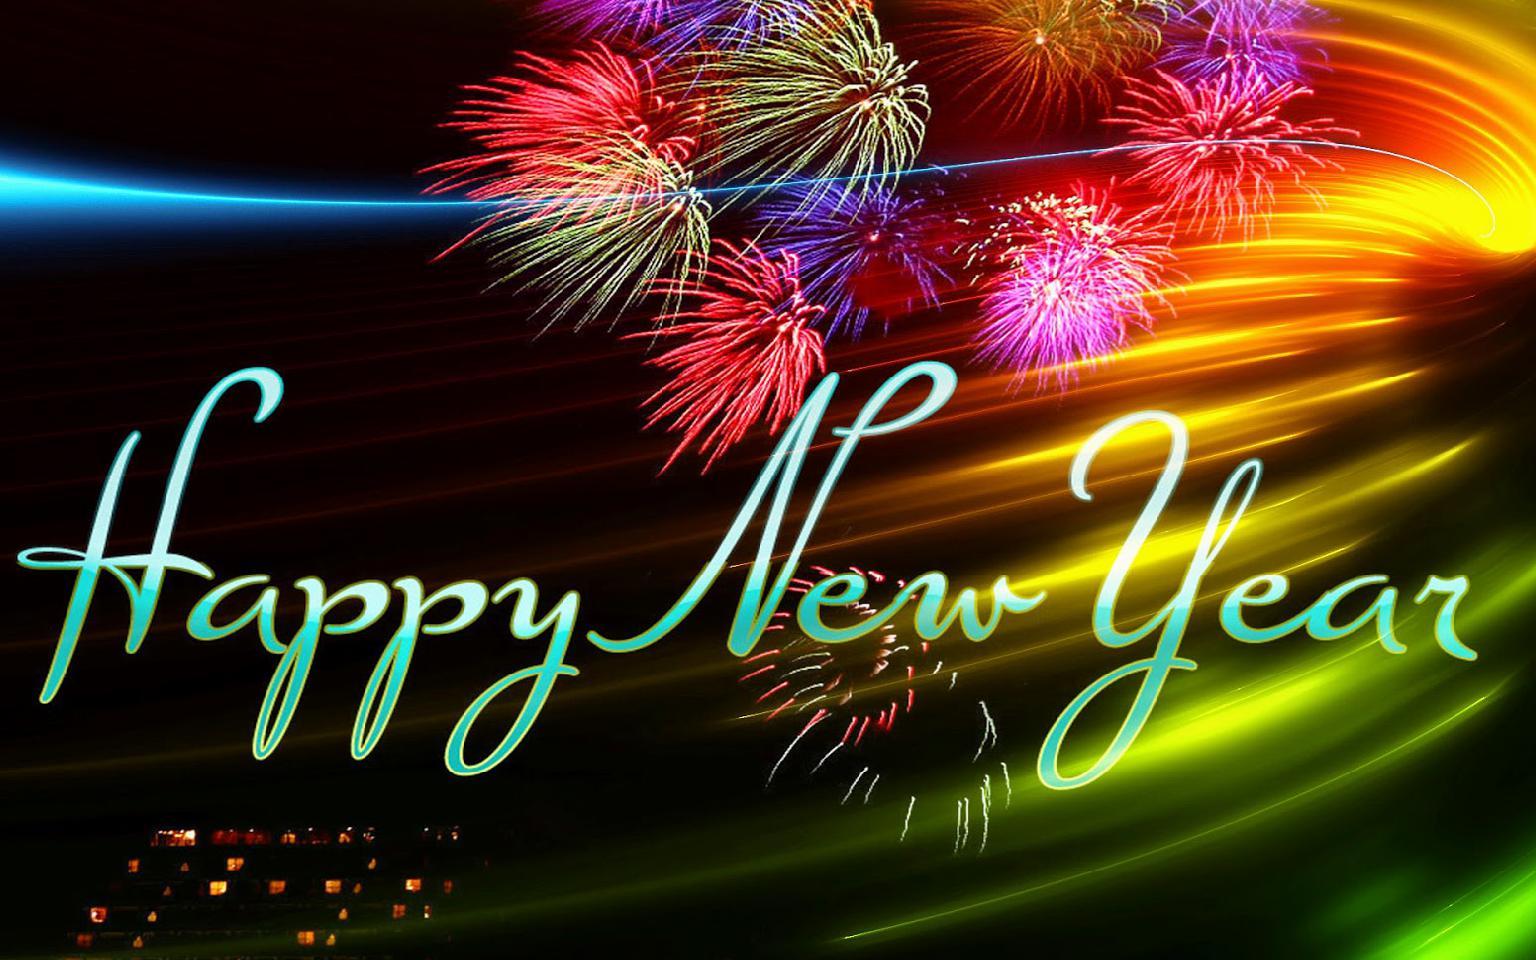 Gambar Selamat Tahun Baru 2016 Kartu Ucapan Happy New Year Hd Dp Bbm Wa Animasi Bergerak Lucu